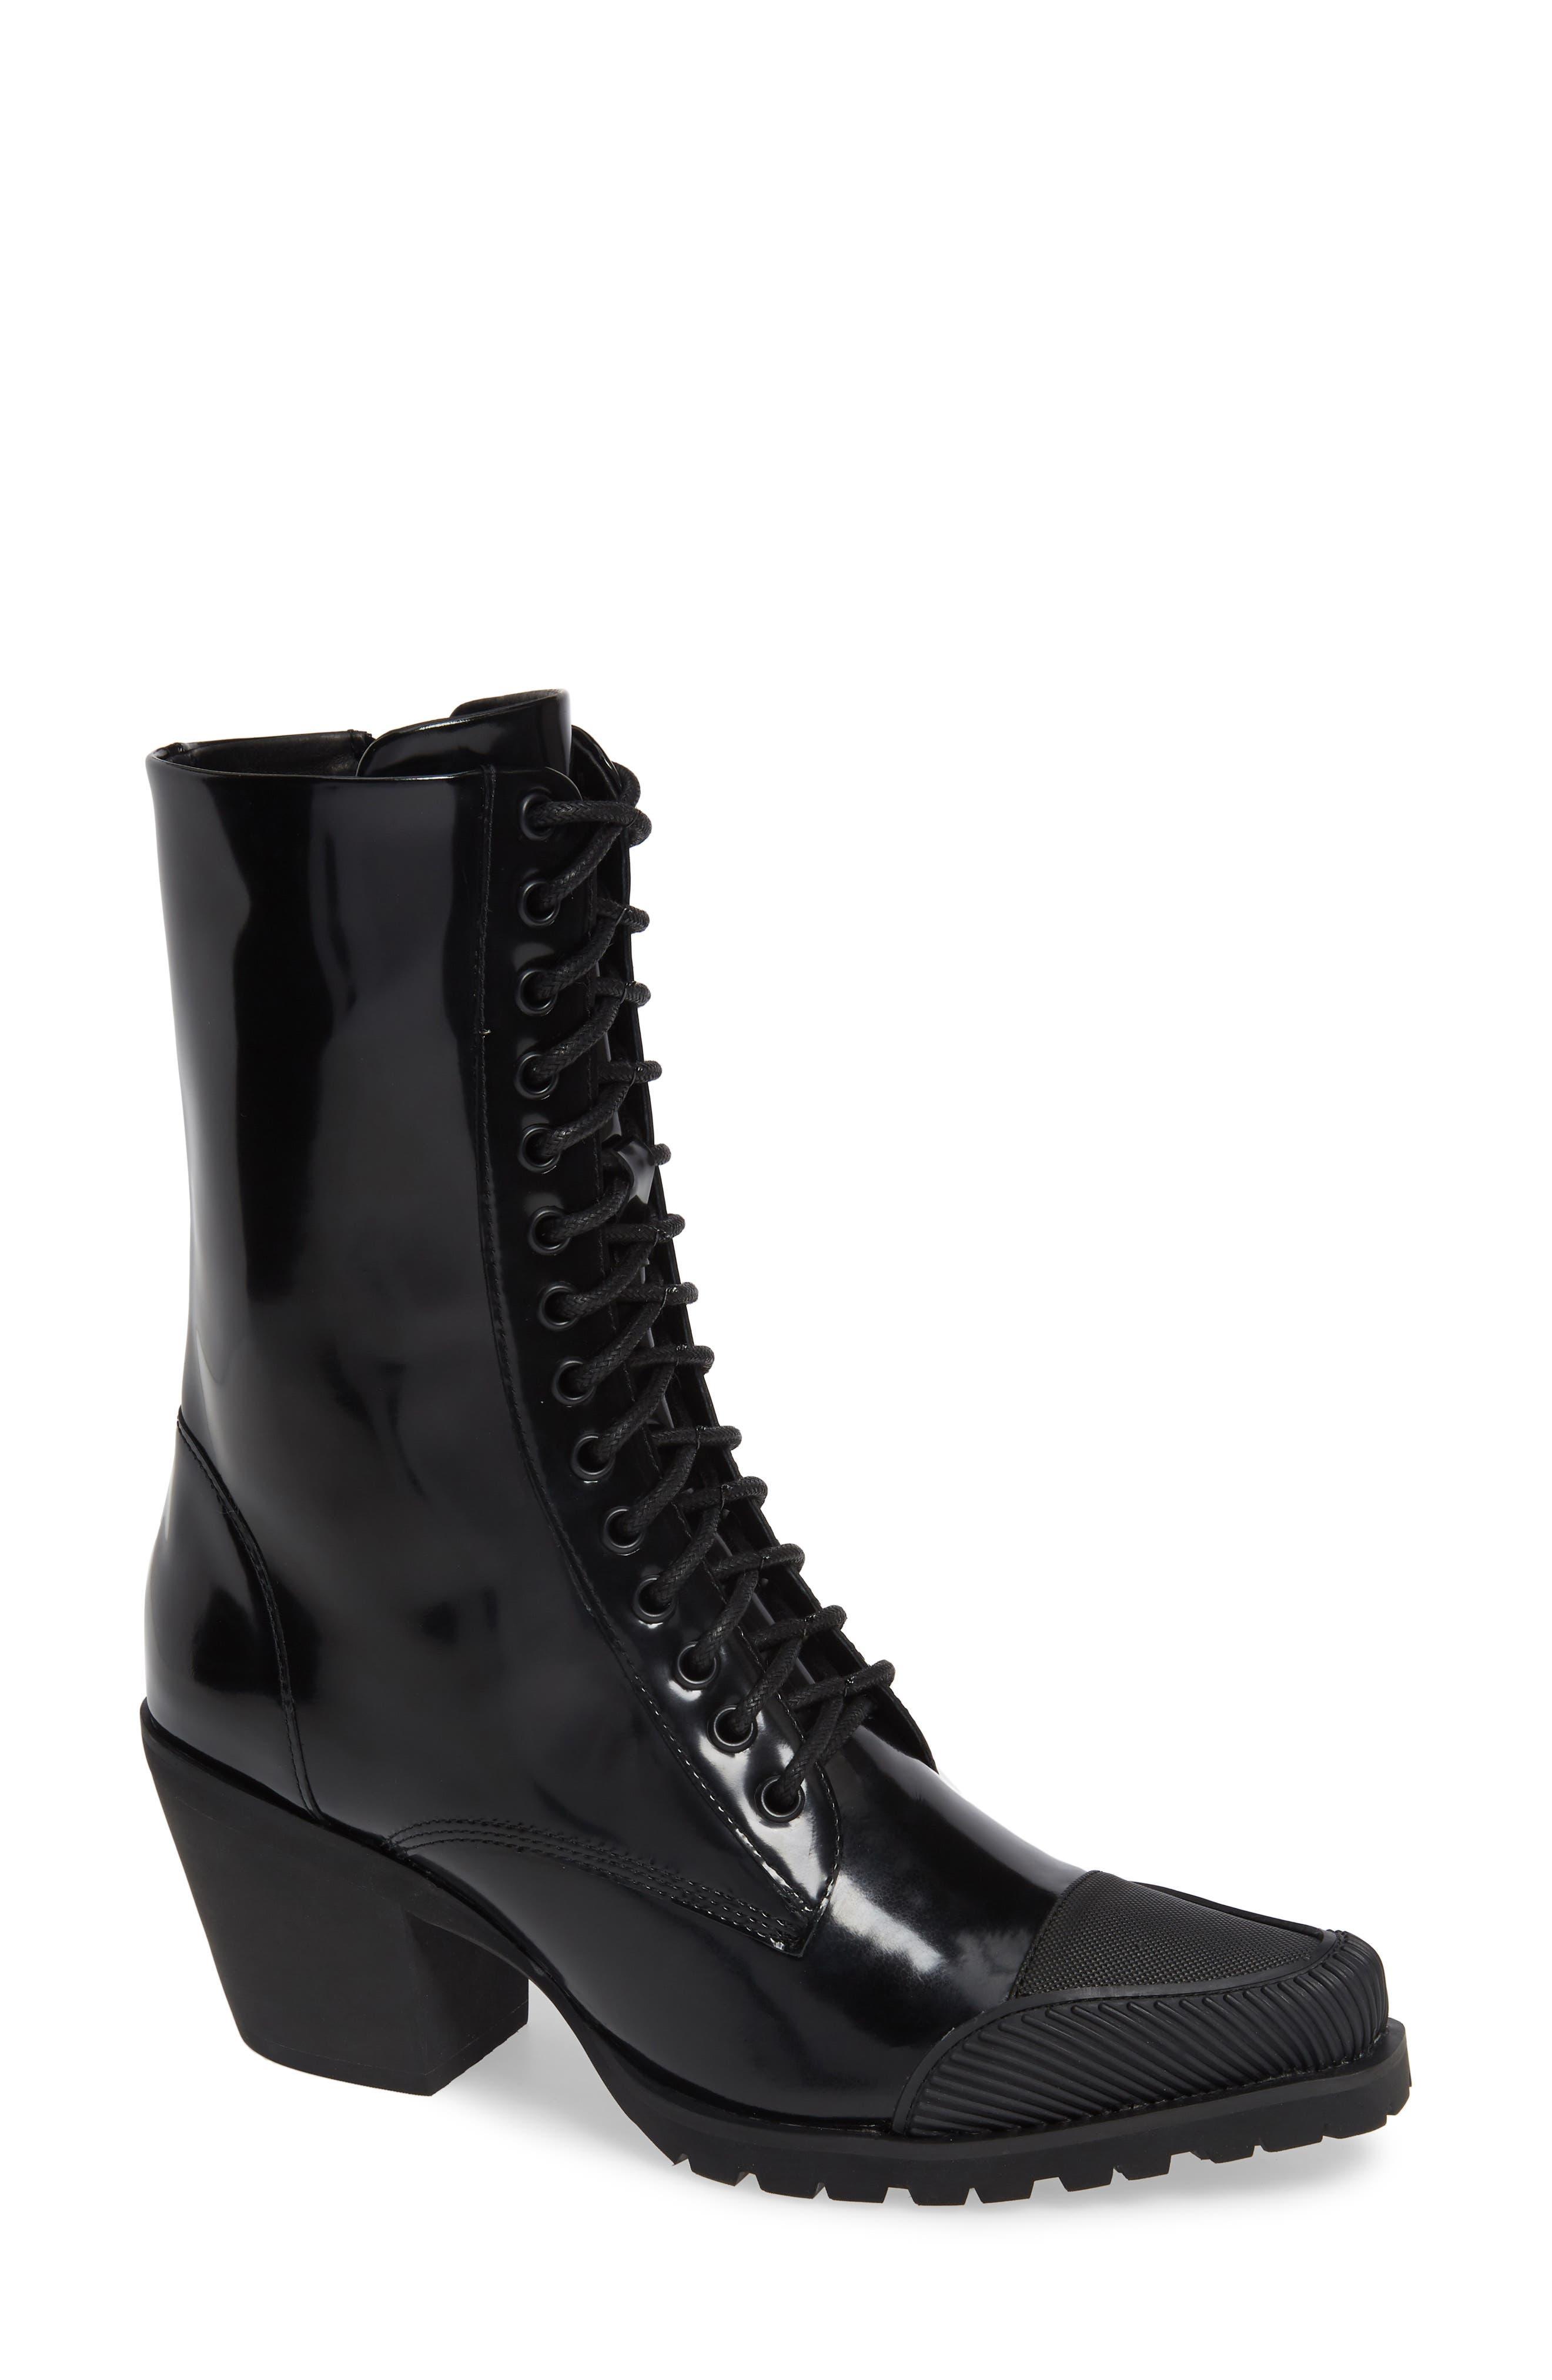 Jeffrey Campbell Vestal Boot, Black